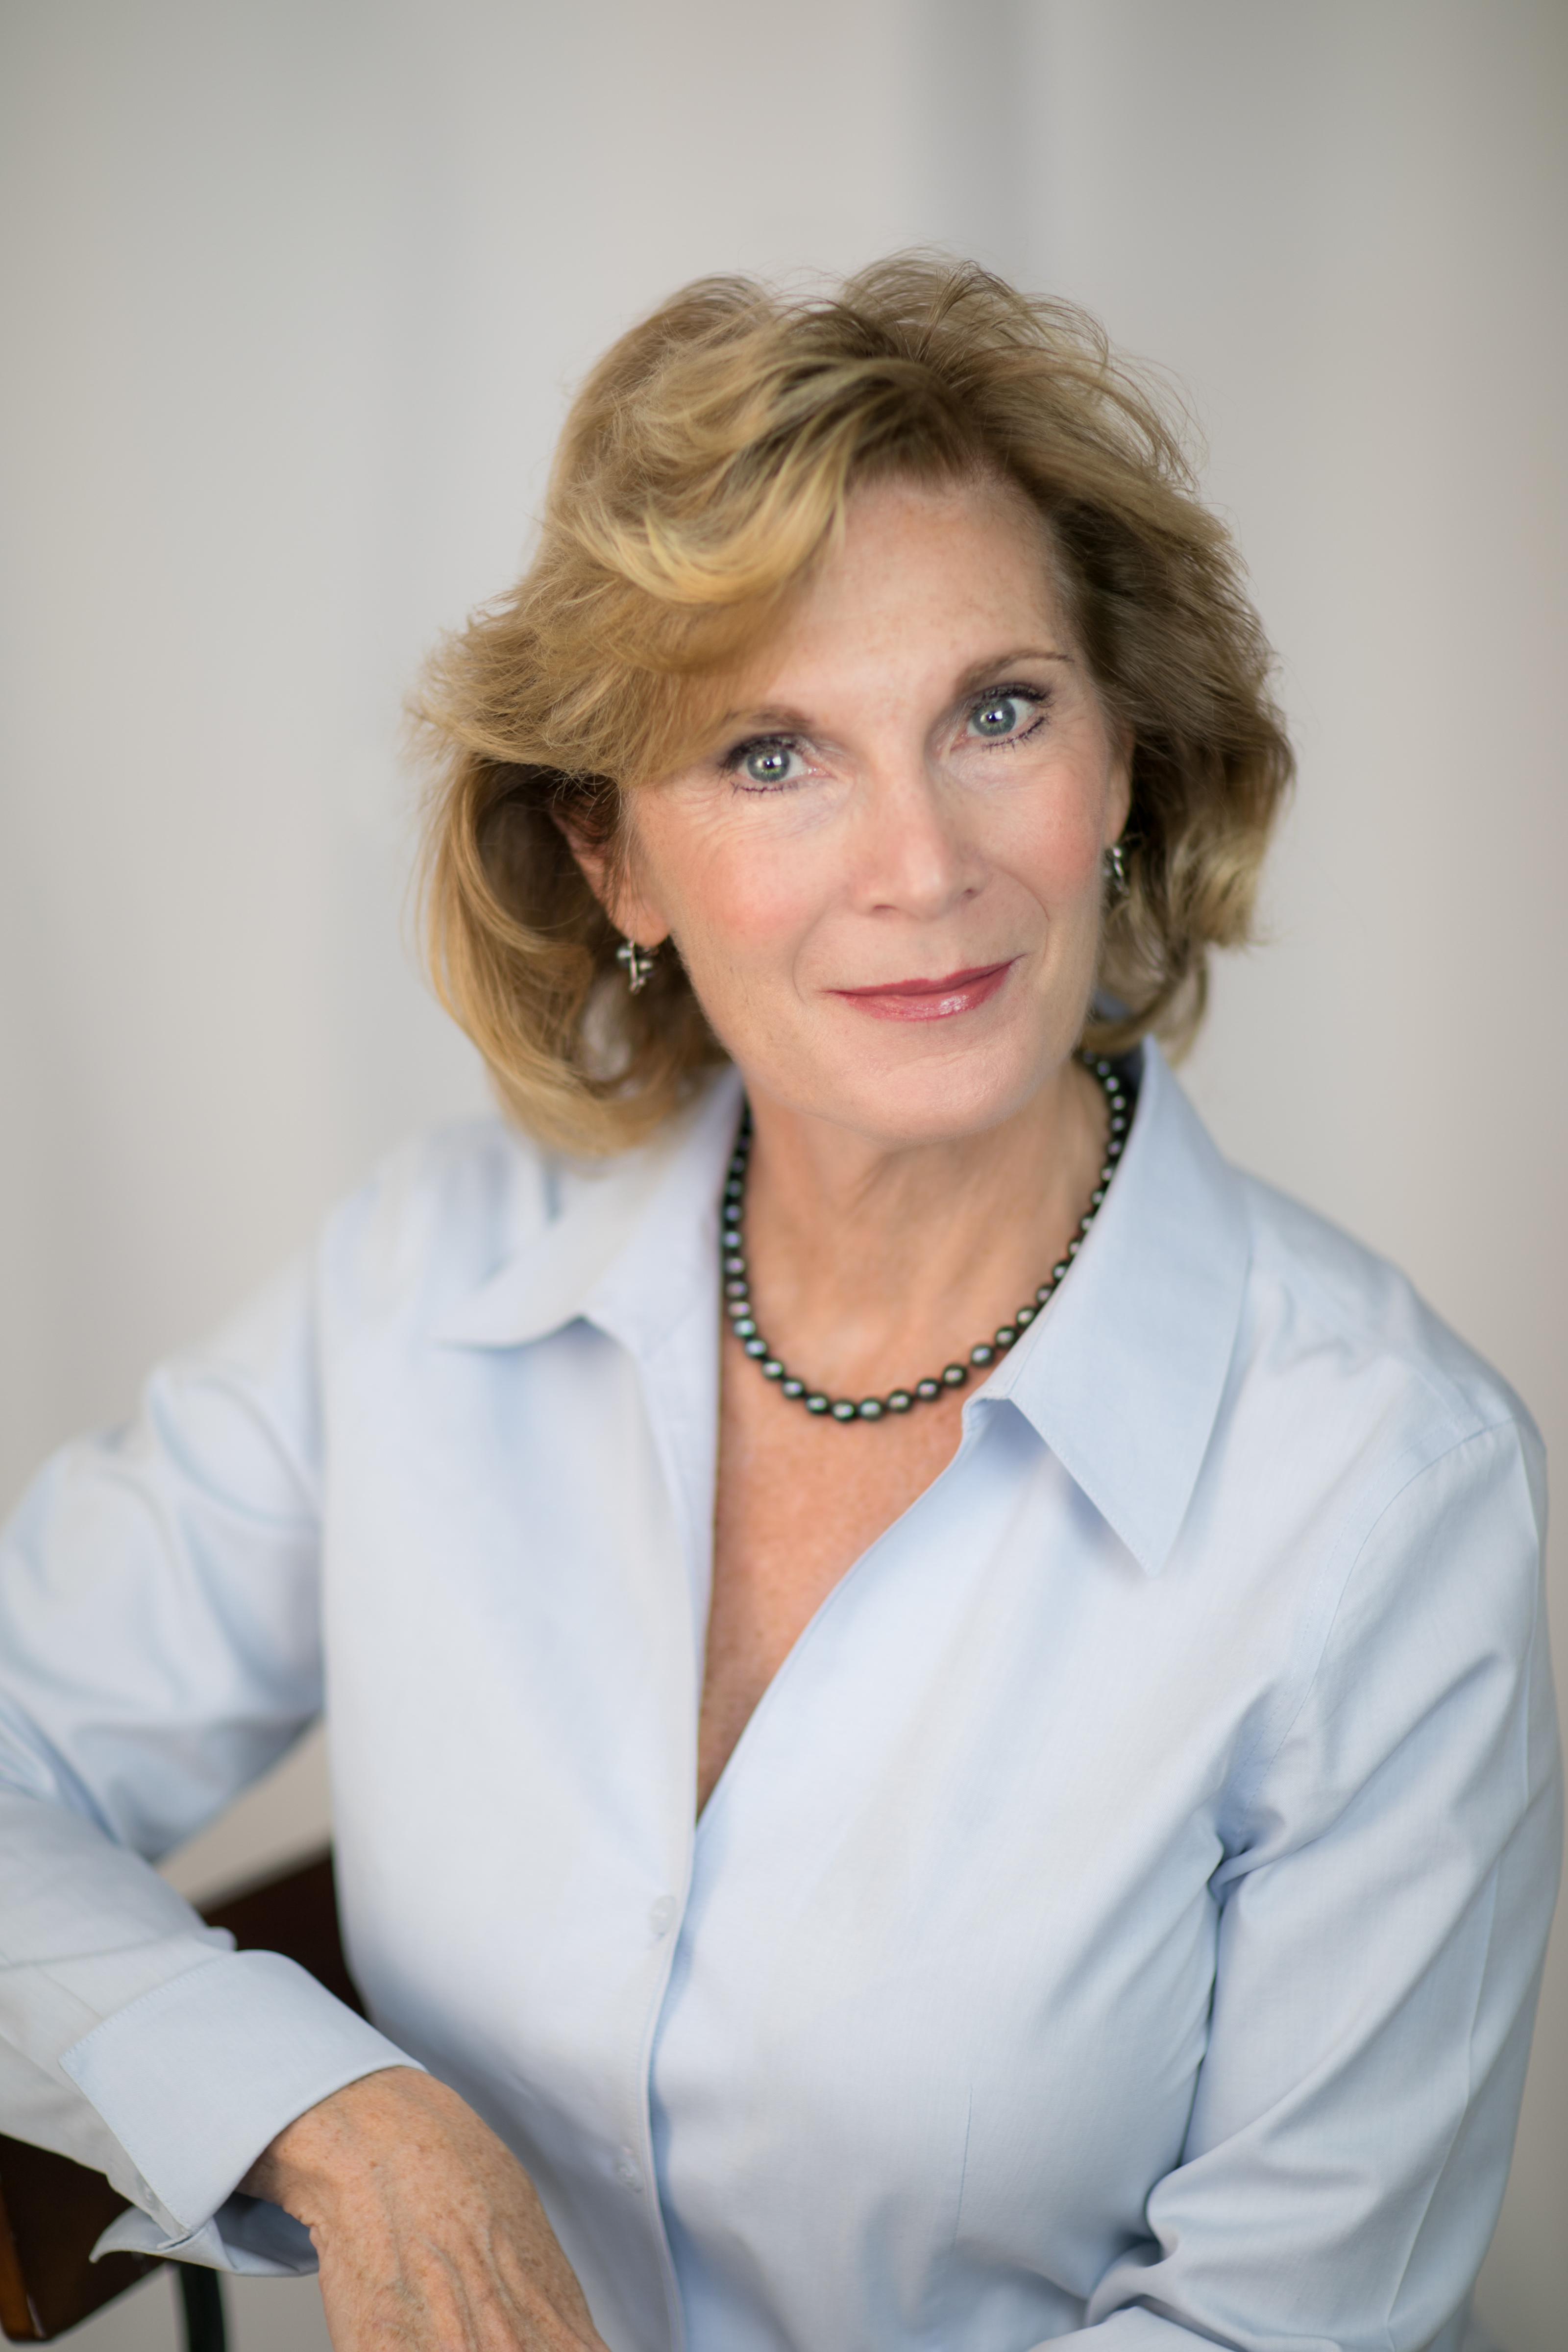 Dr. Debra K. Carter